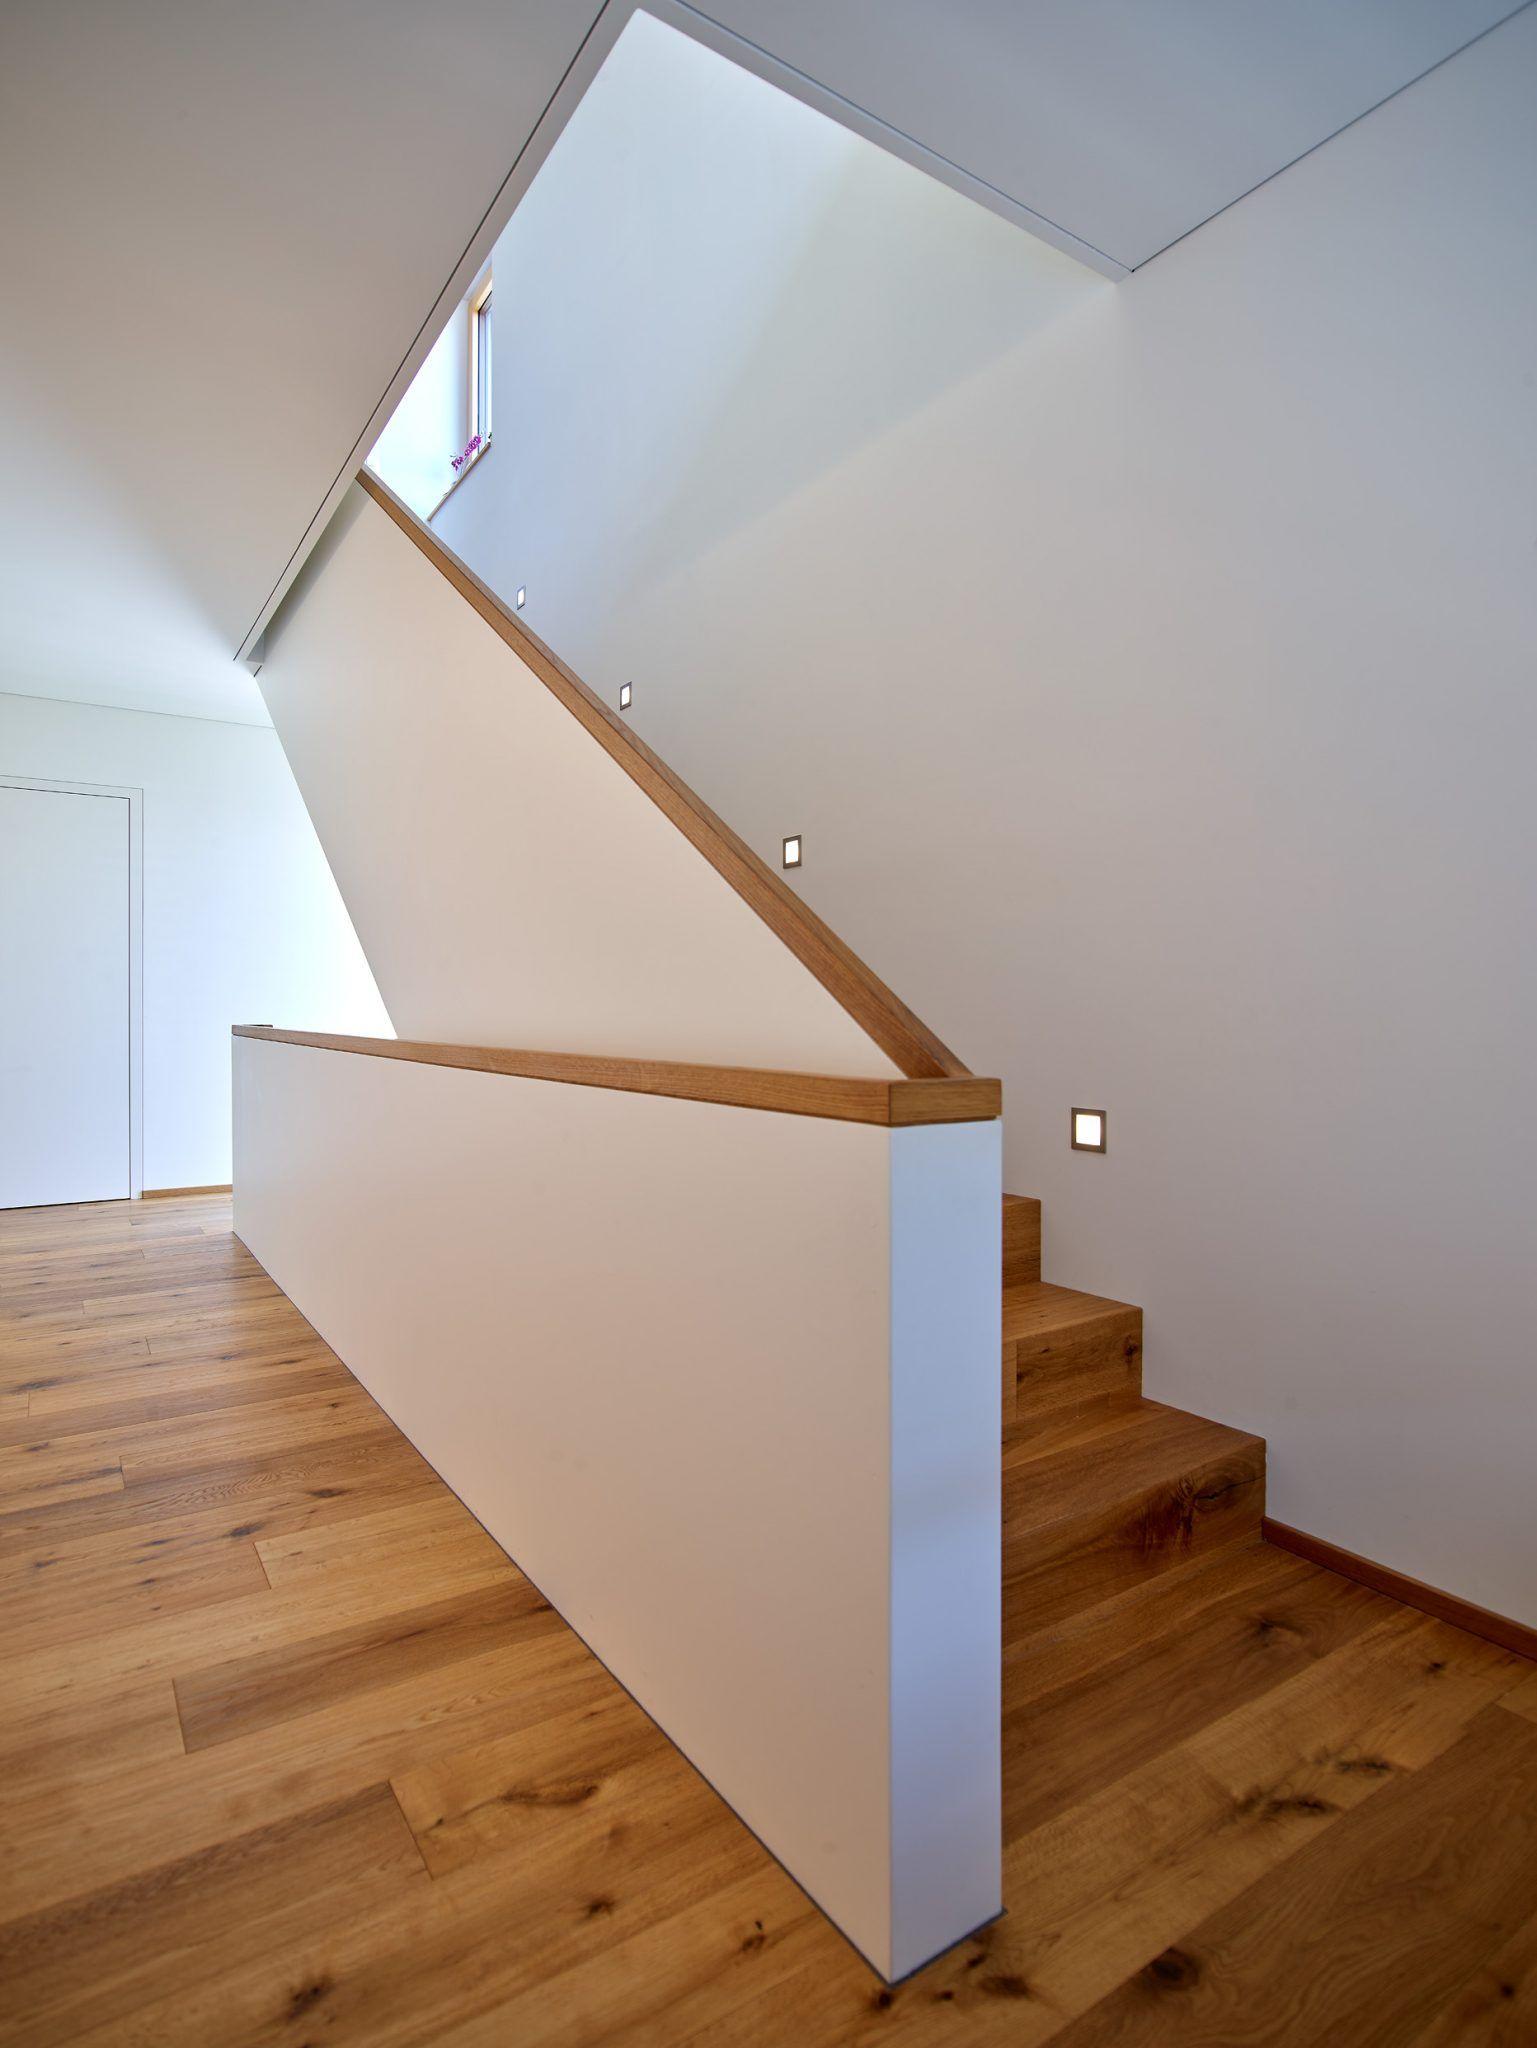 Holztreppen Konstruktion und Montage